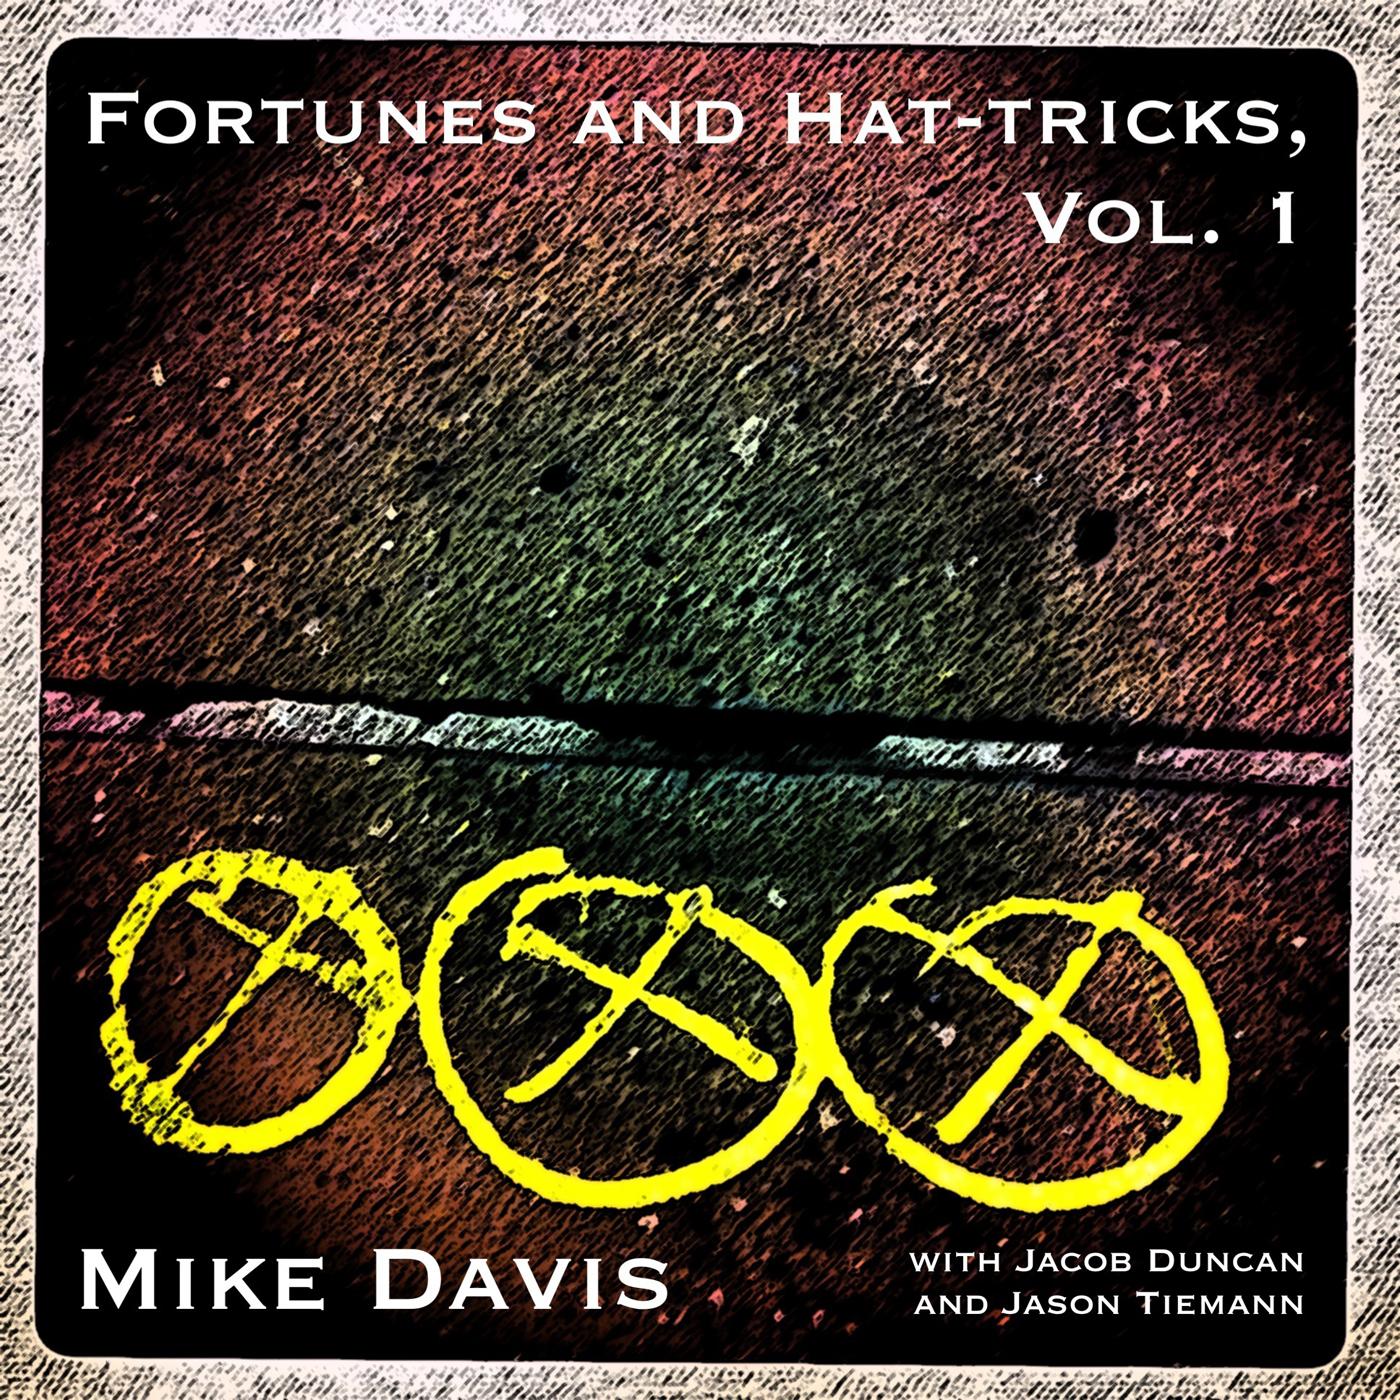 Fortunes vol. 1 cover art